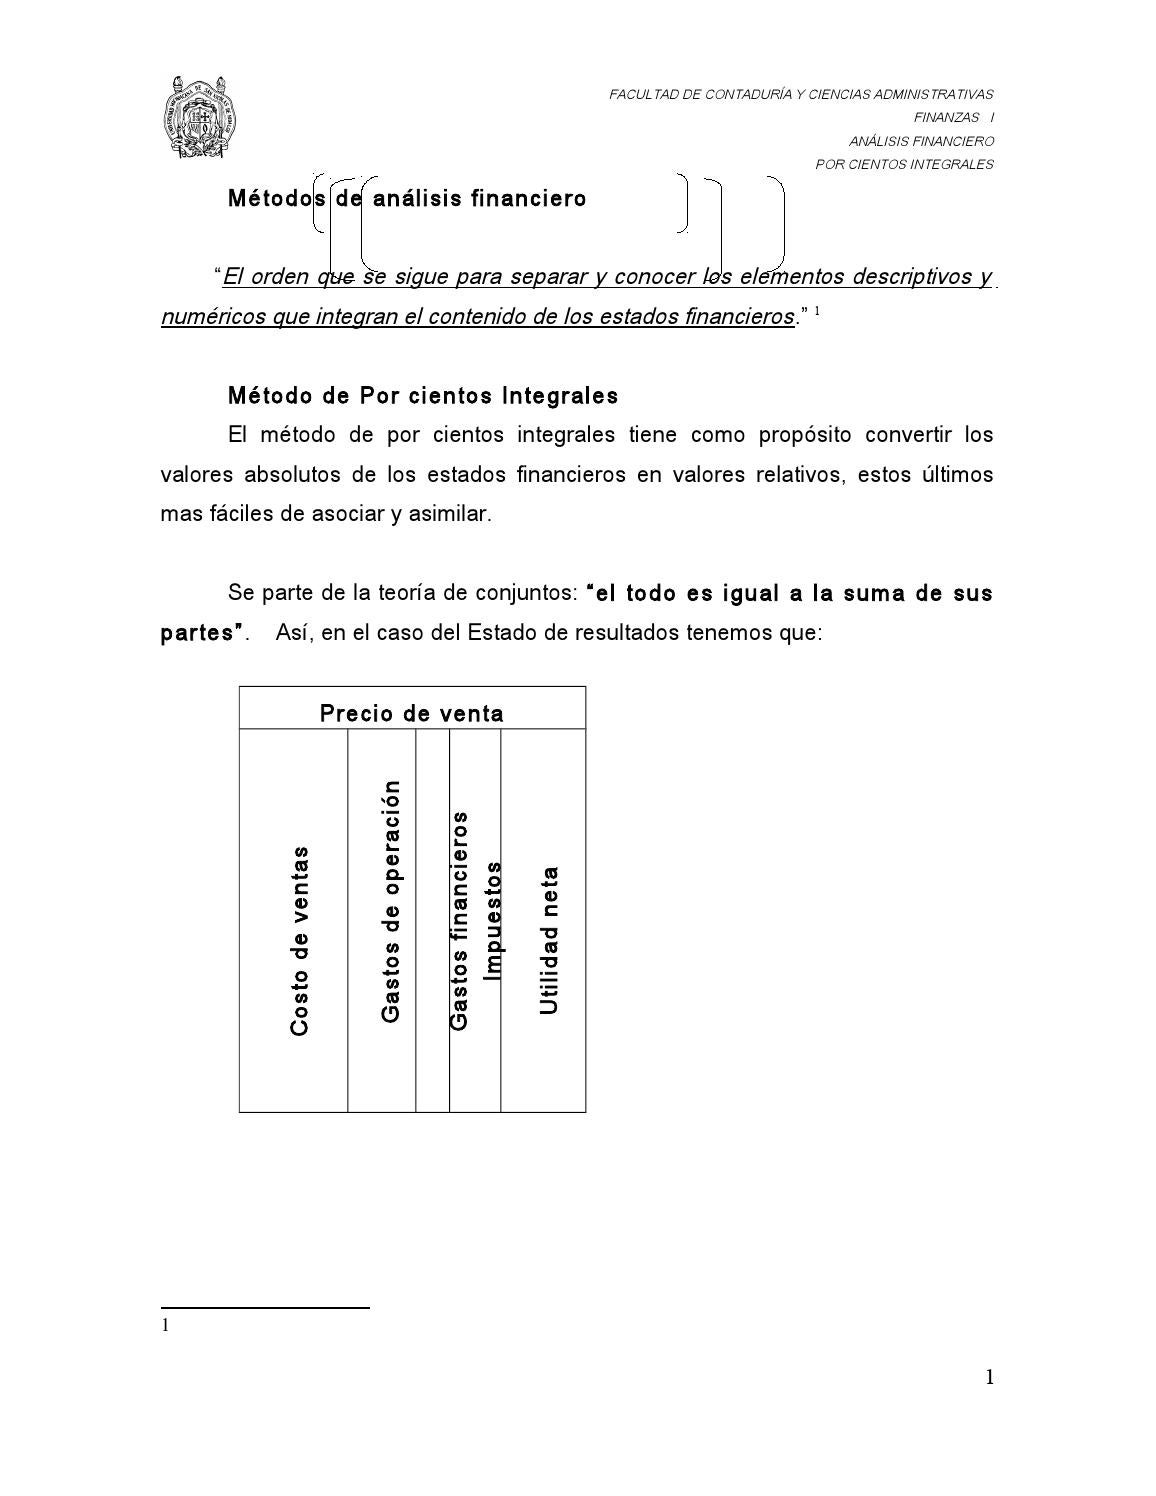 8 porcientos integrales 1 by alvarez chaparra issuu